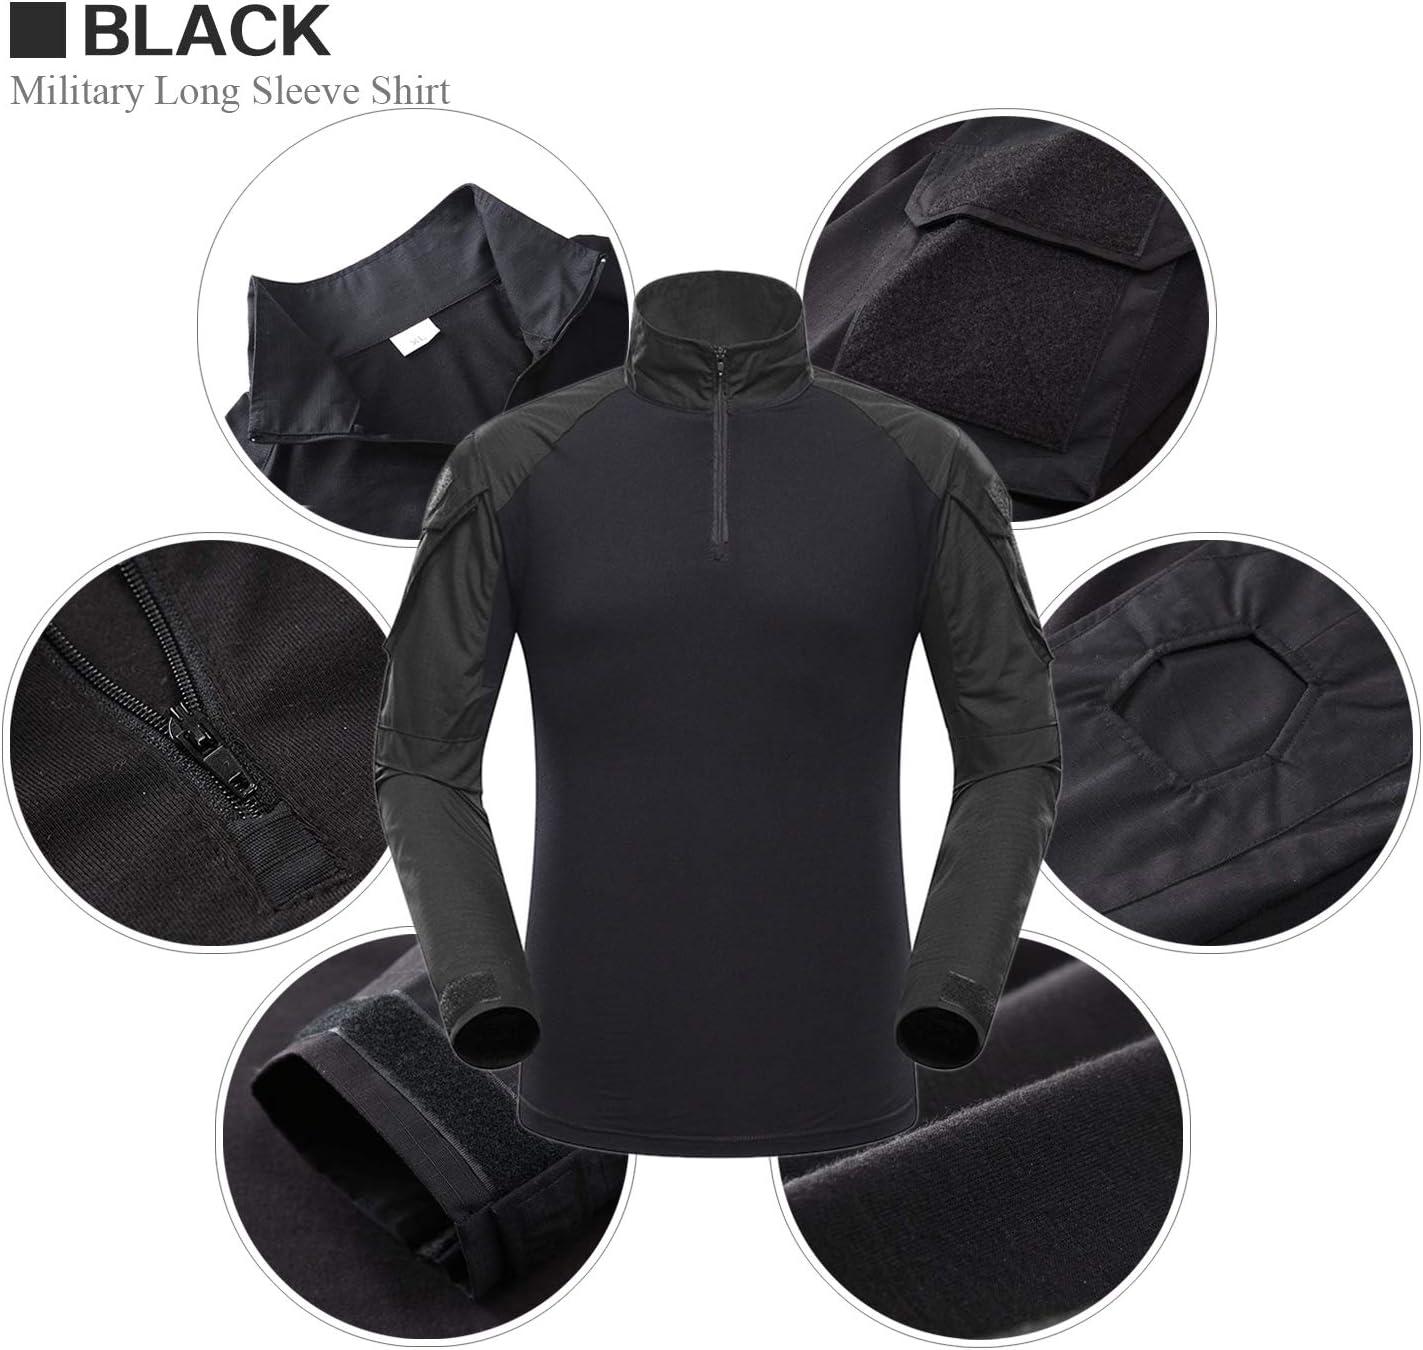 LHHMZ Camisa de Manga Larga Militar para Hombres Caza de Combate Negra Caminatas de Tiro con Cremallera para Uso Informal y al Aire Libre